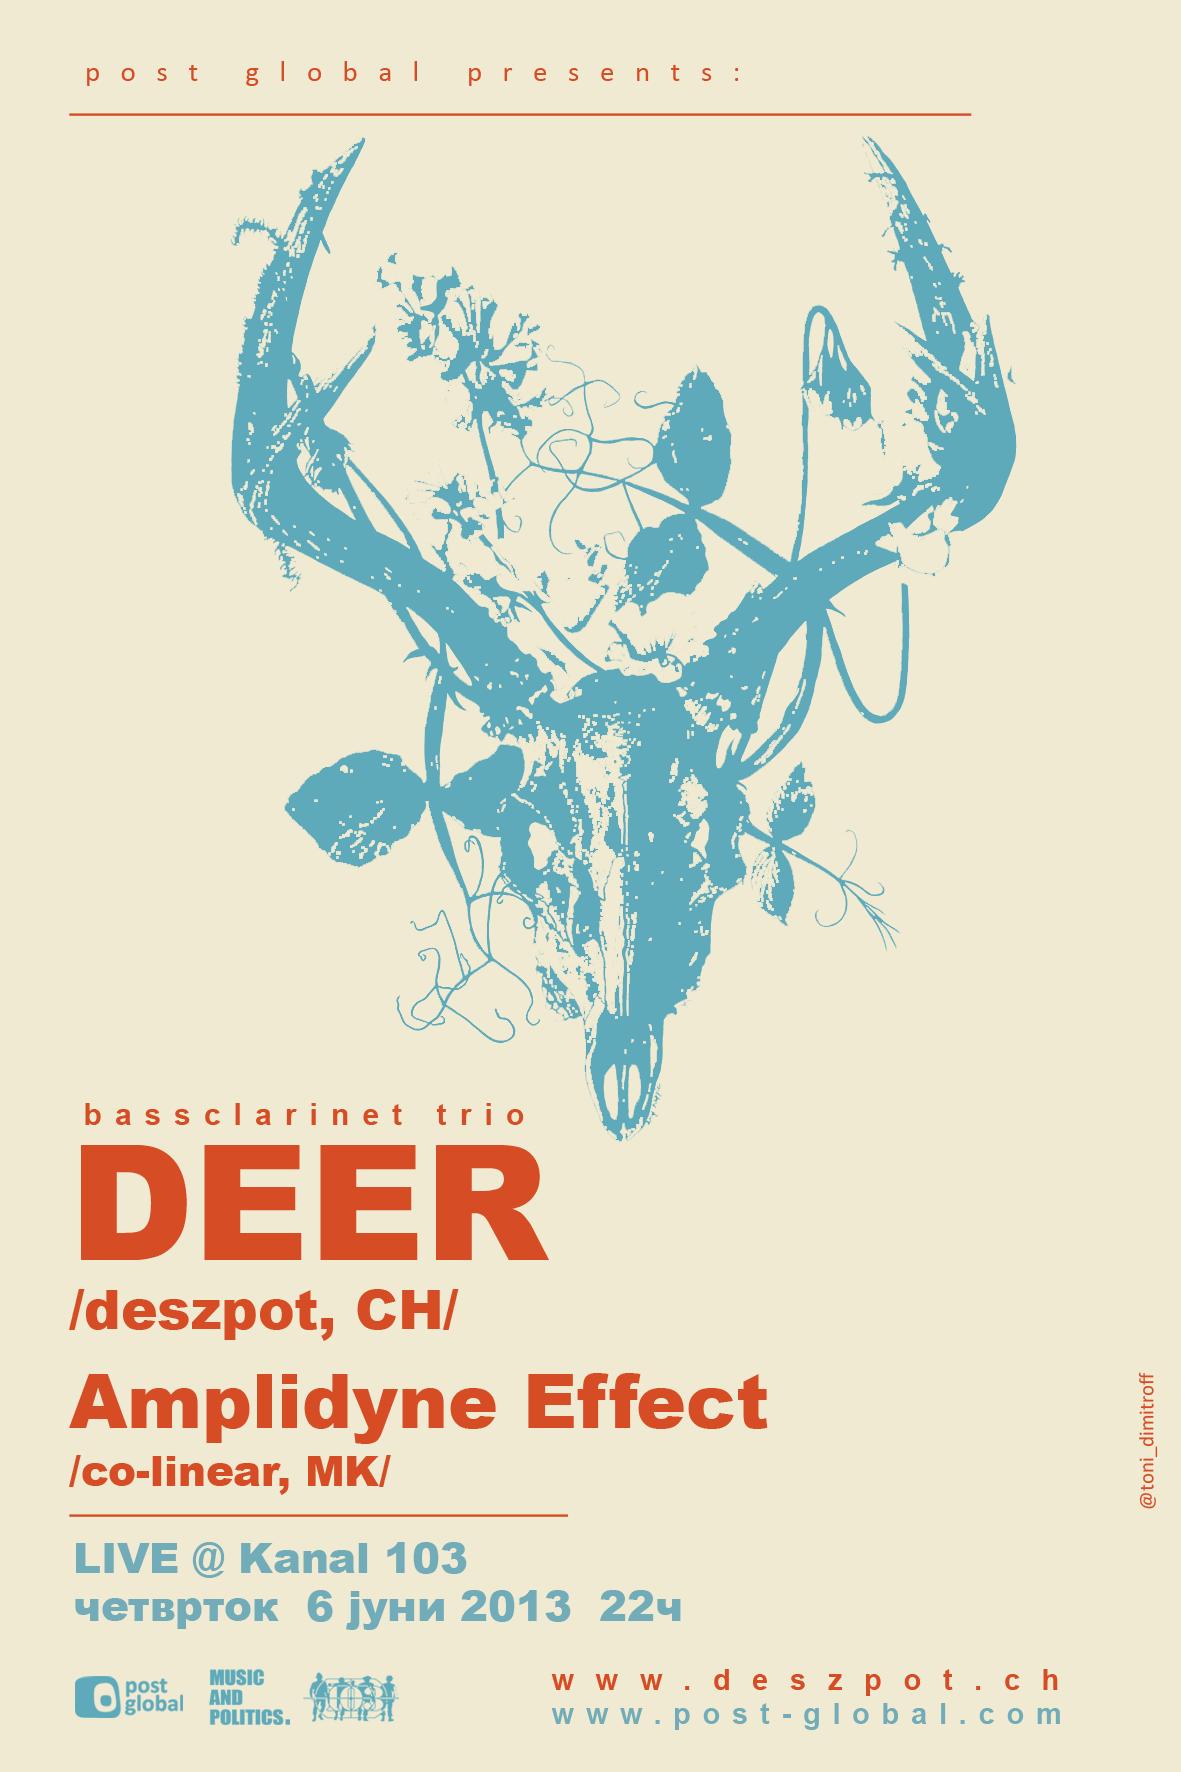 Amplidyne Effect & DEER @ Kanal 103 2013